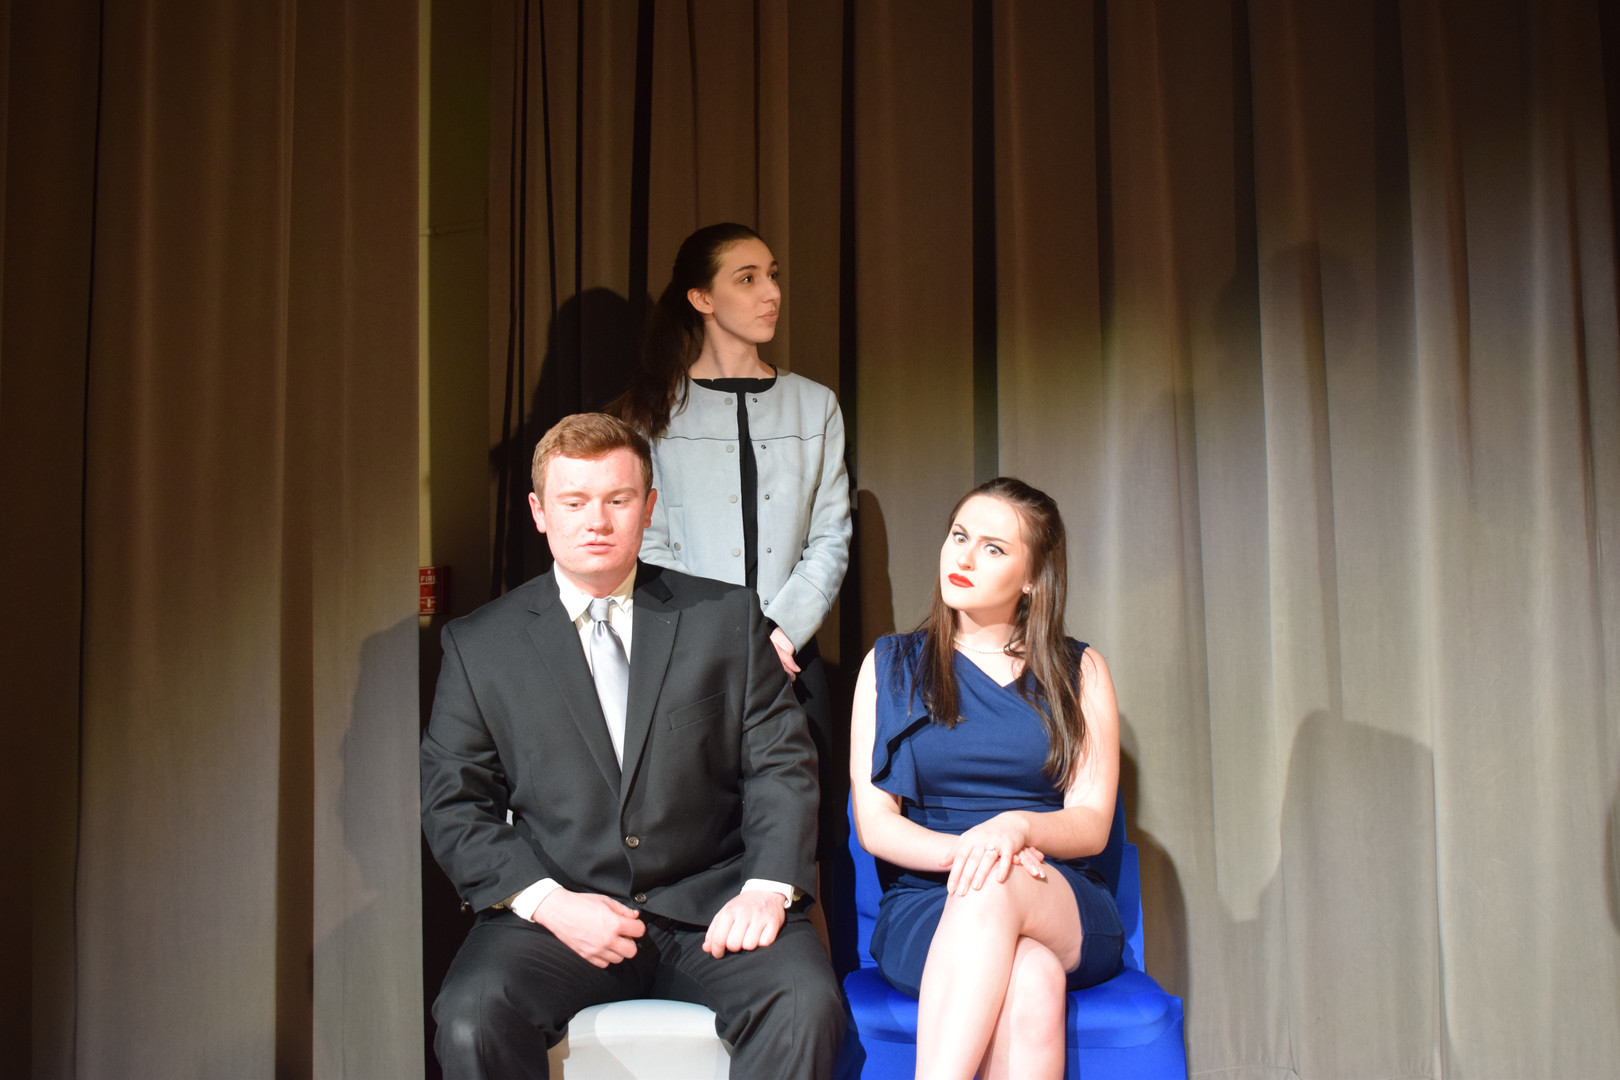 Claudius, Polonius, and Gertrude